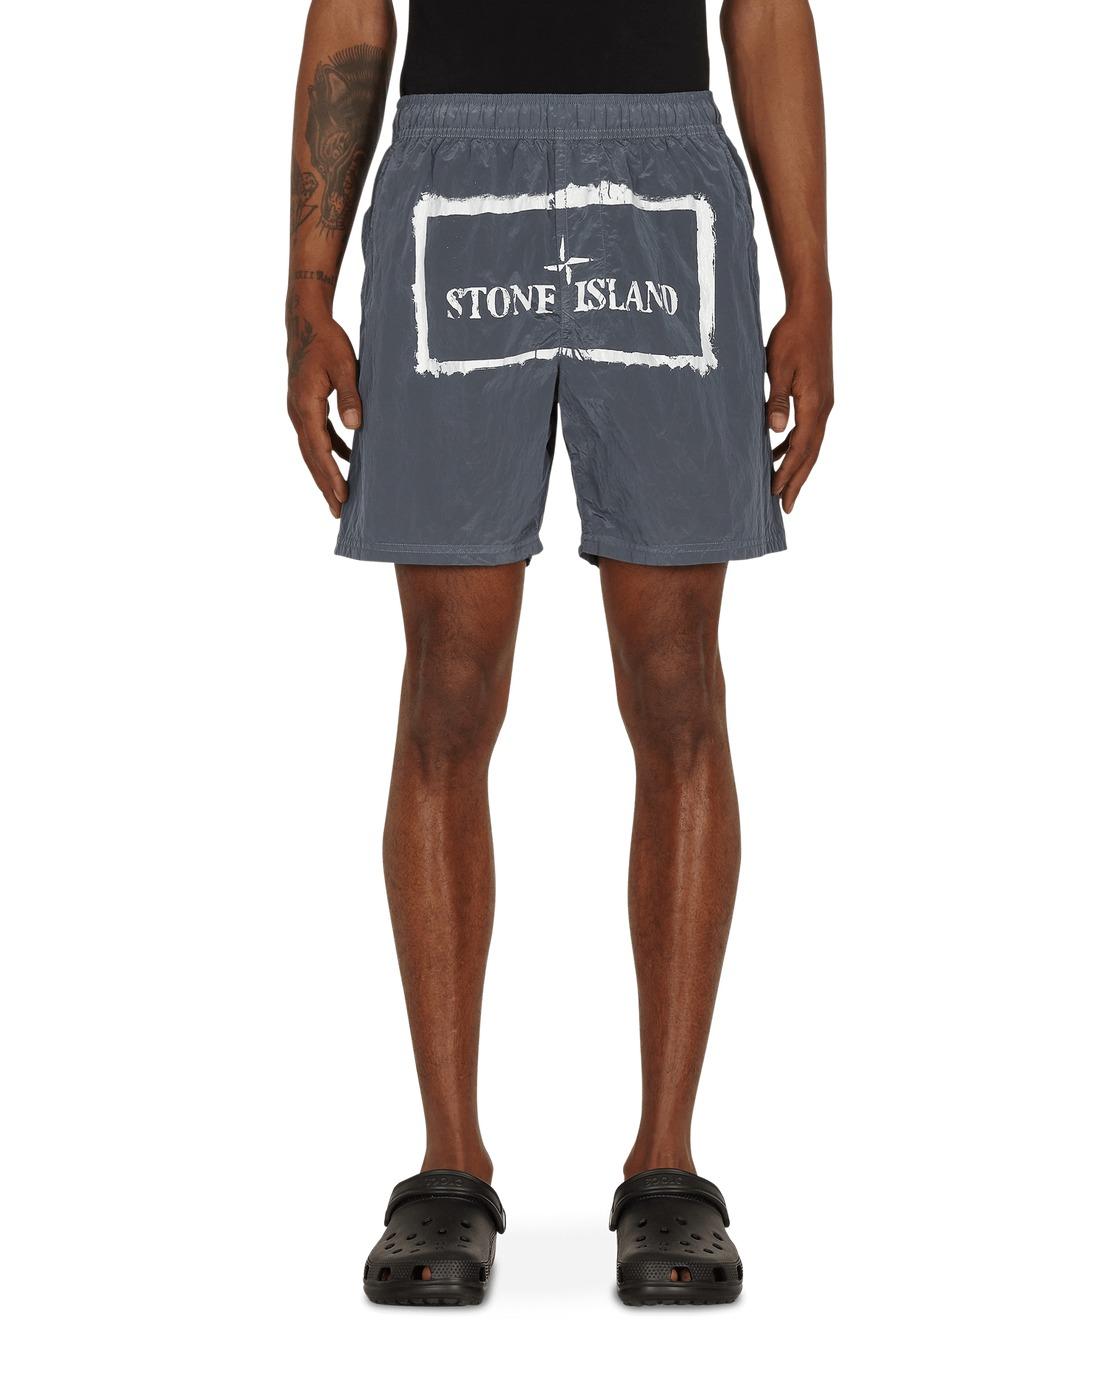 Stone Island Nylon Metal Stencil Print Swim Shorts Grey